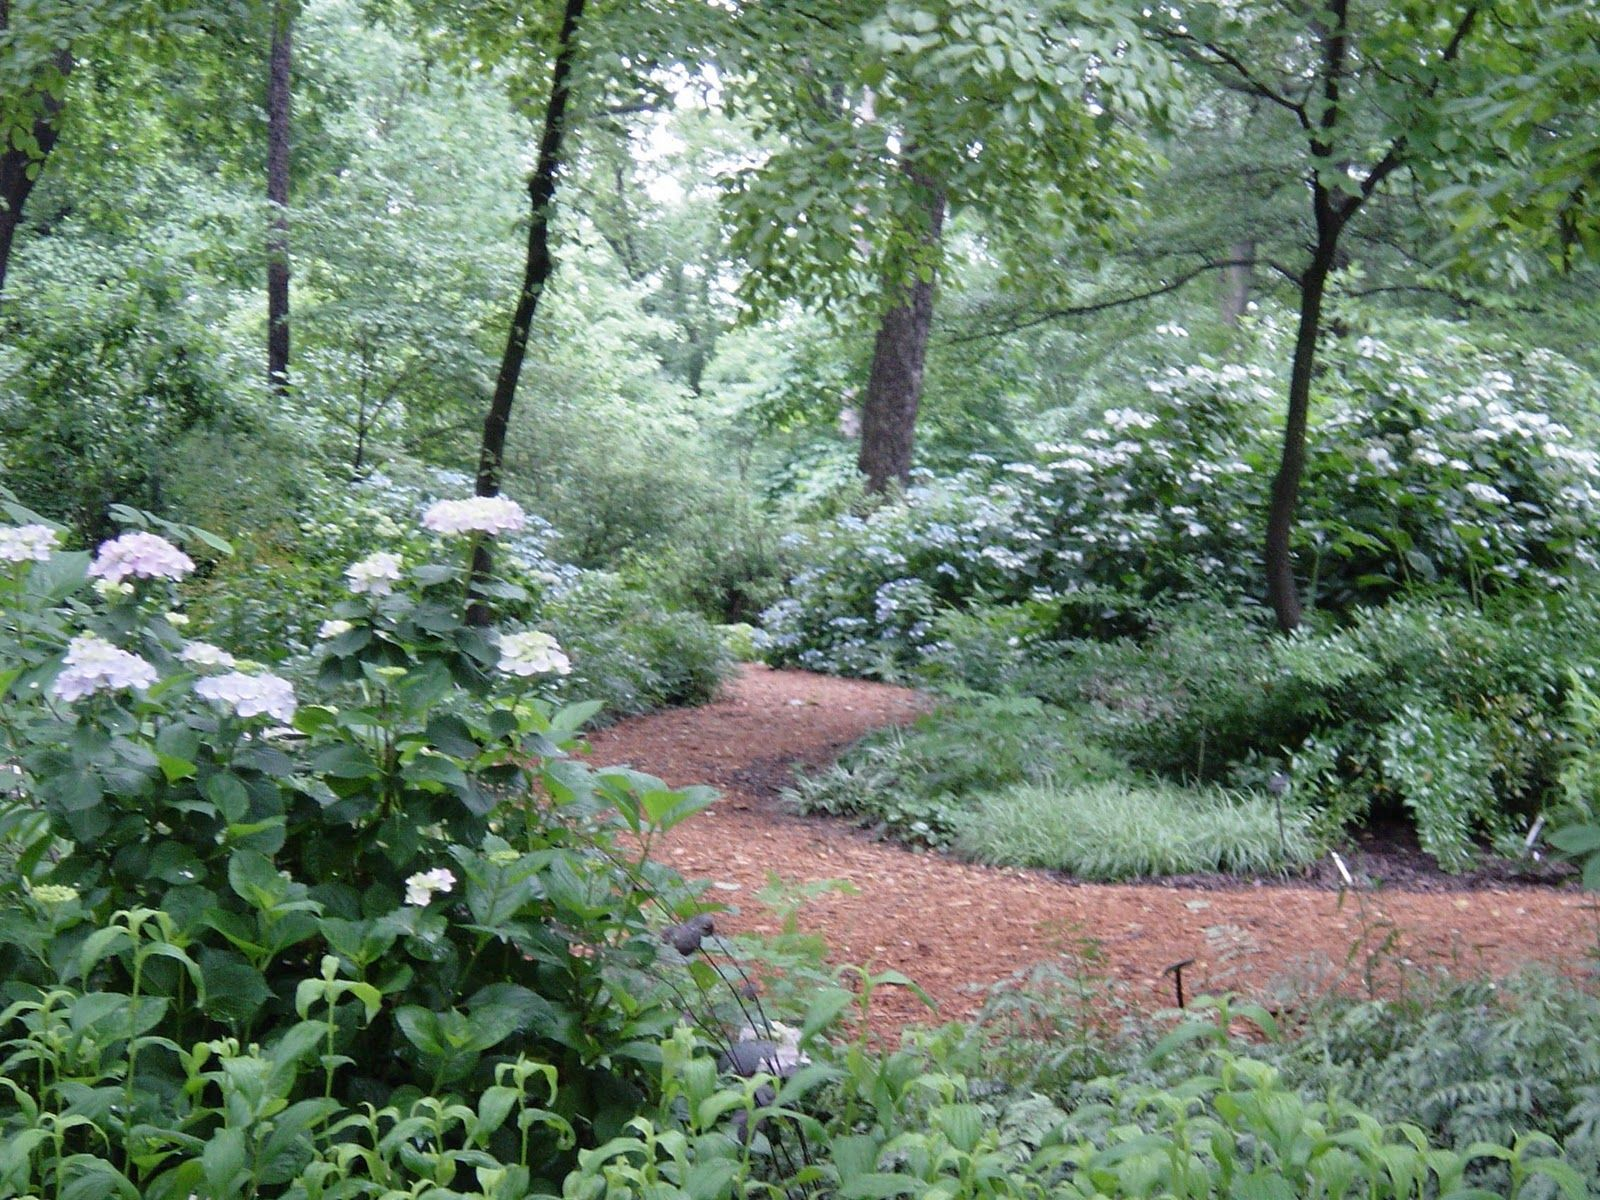 Crabapple LandscapExperts: Summer Flowering Shrubs, Part 3 of 4